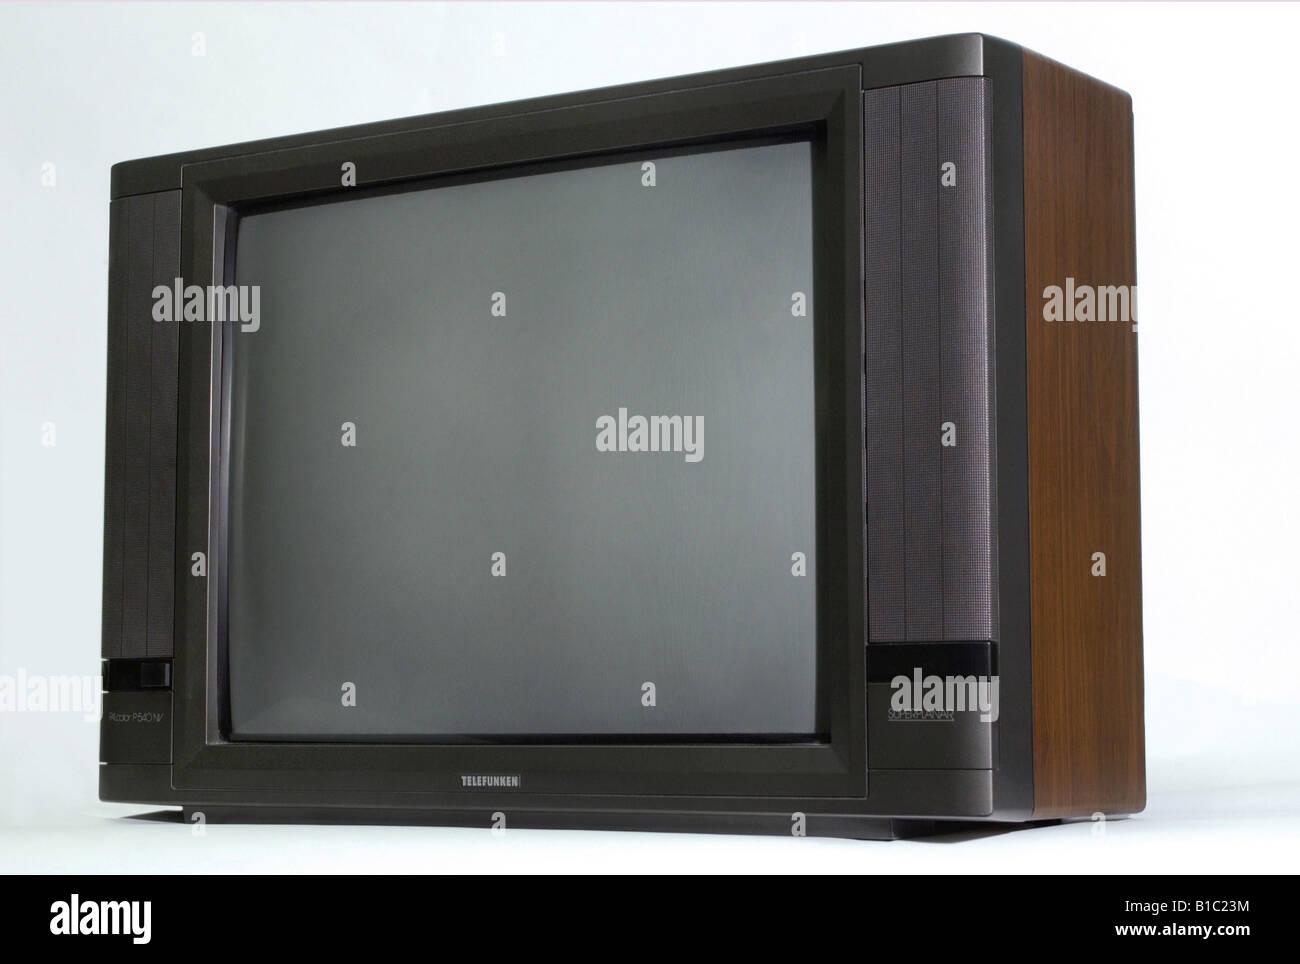 Telefunken Televisions Stock Photos & Telefunken Televisions